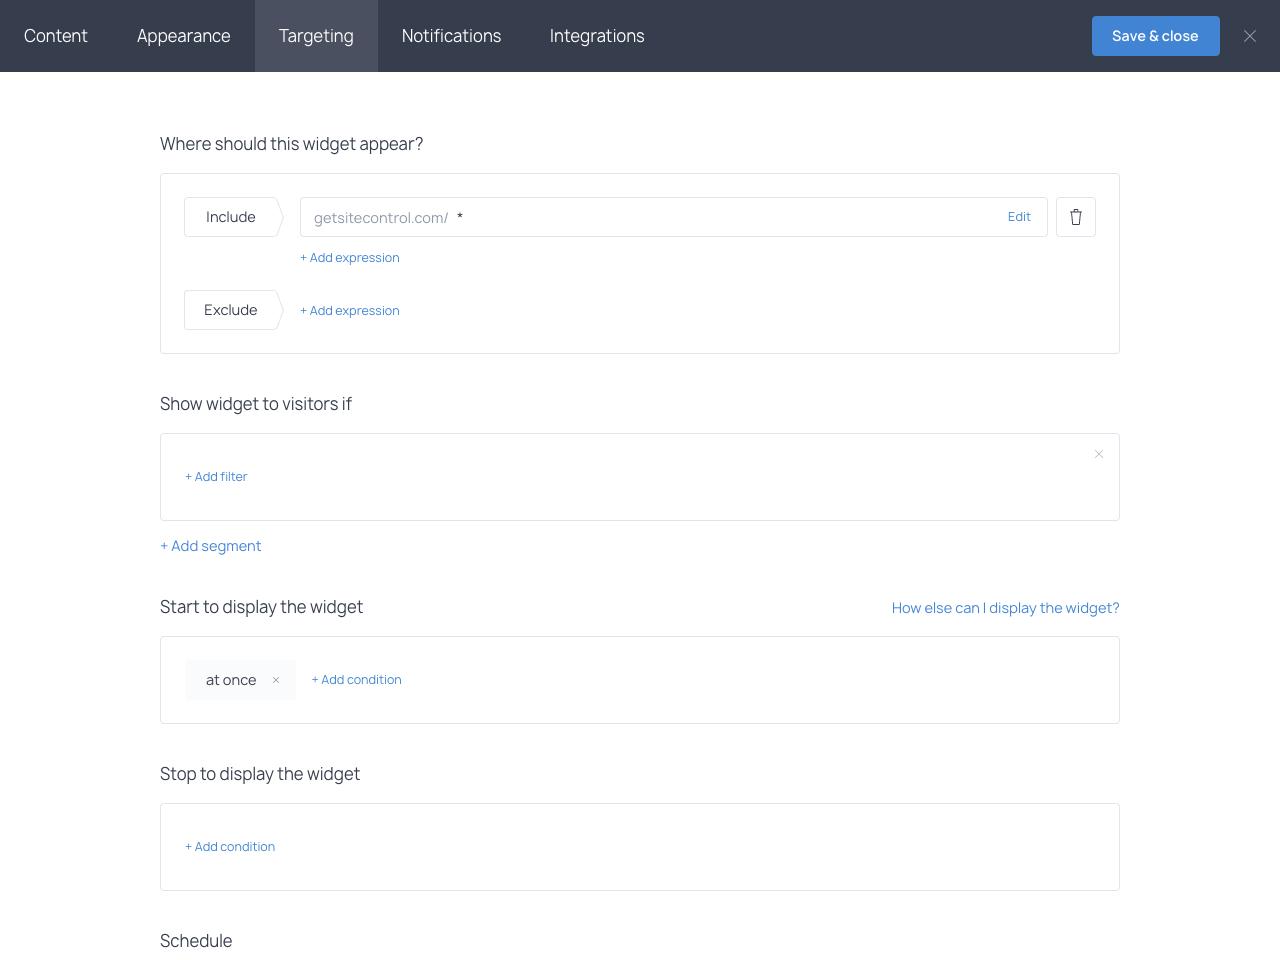 Getsitecontrol online form targeting options